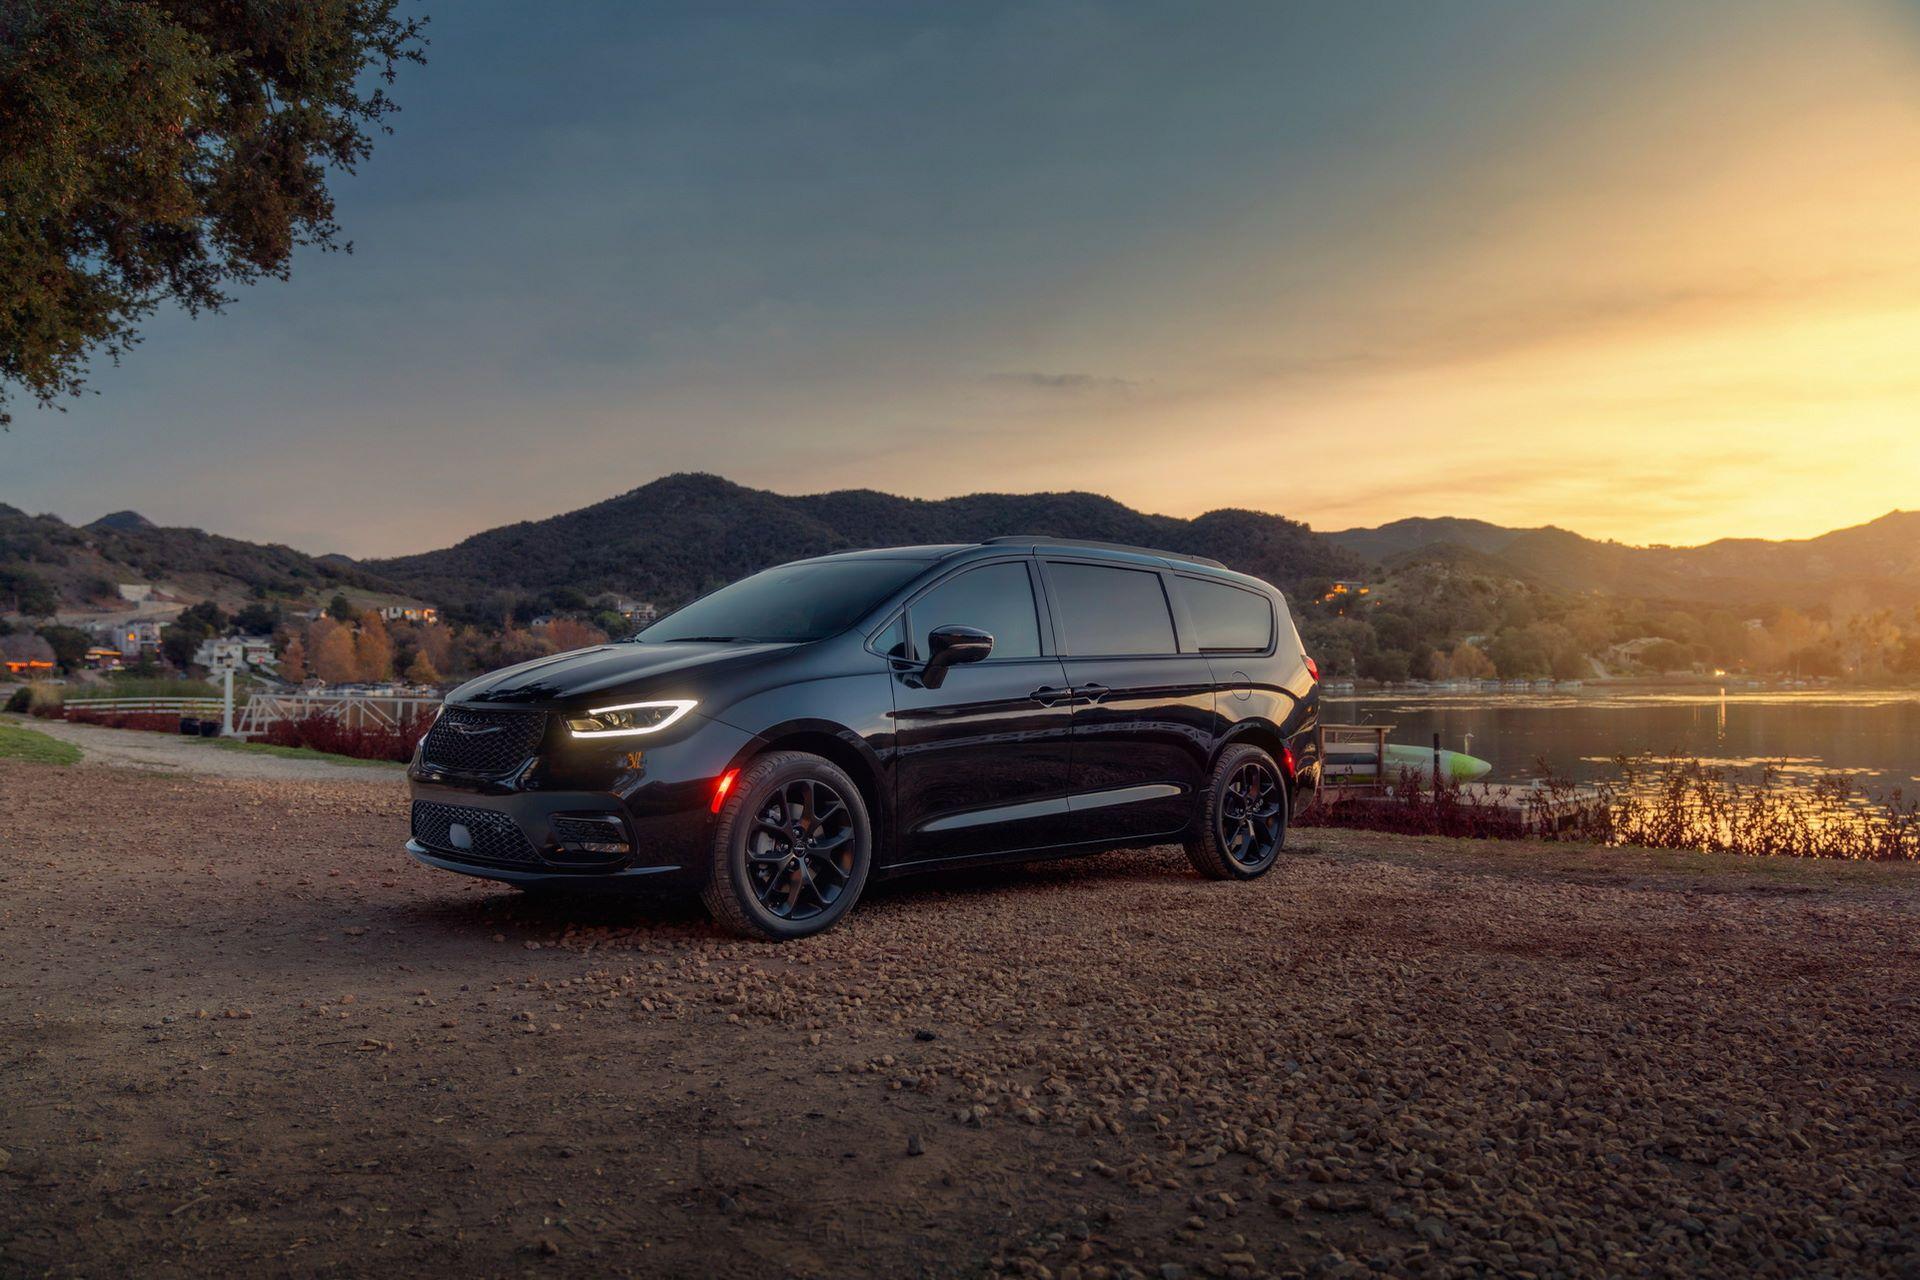 2021-Chrysler-Pacifica-96